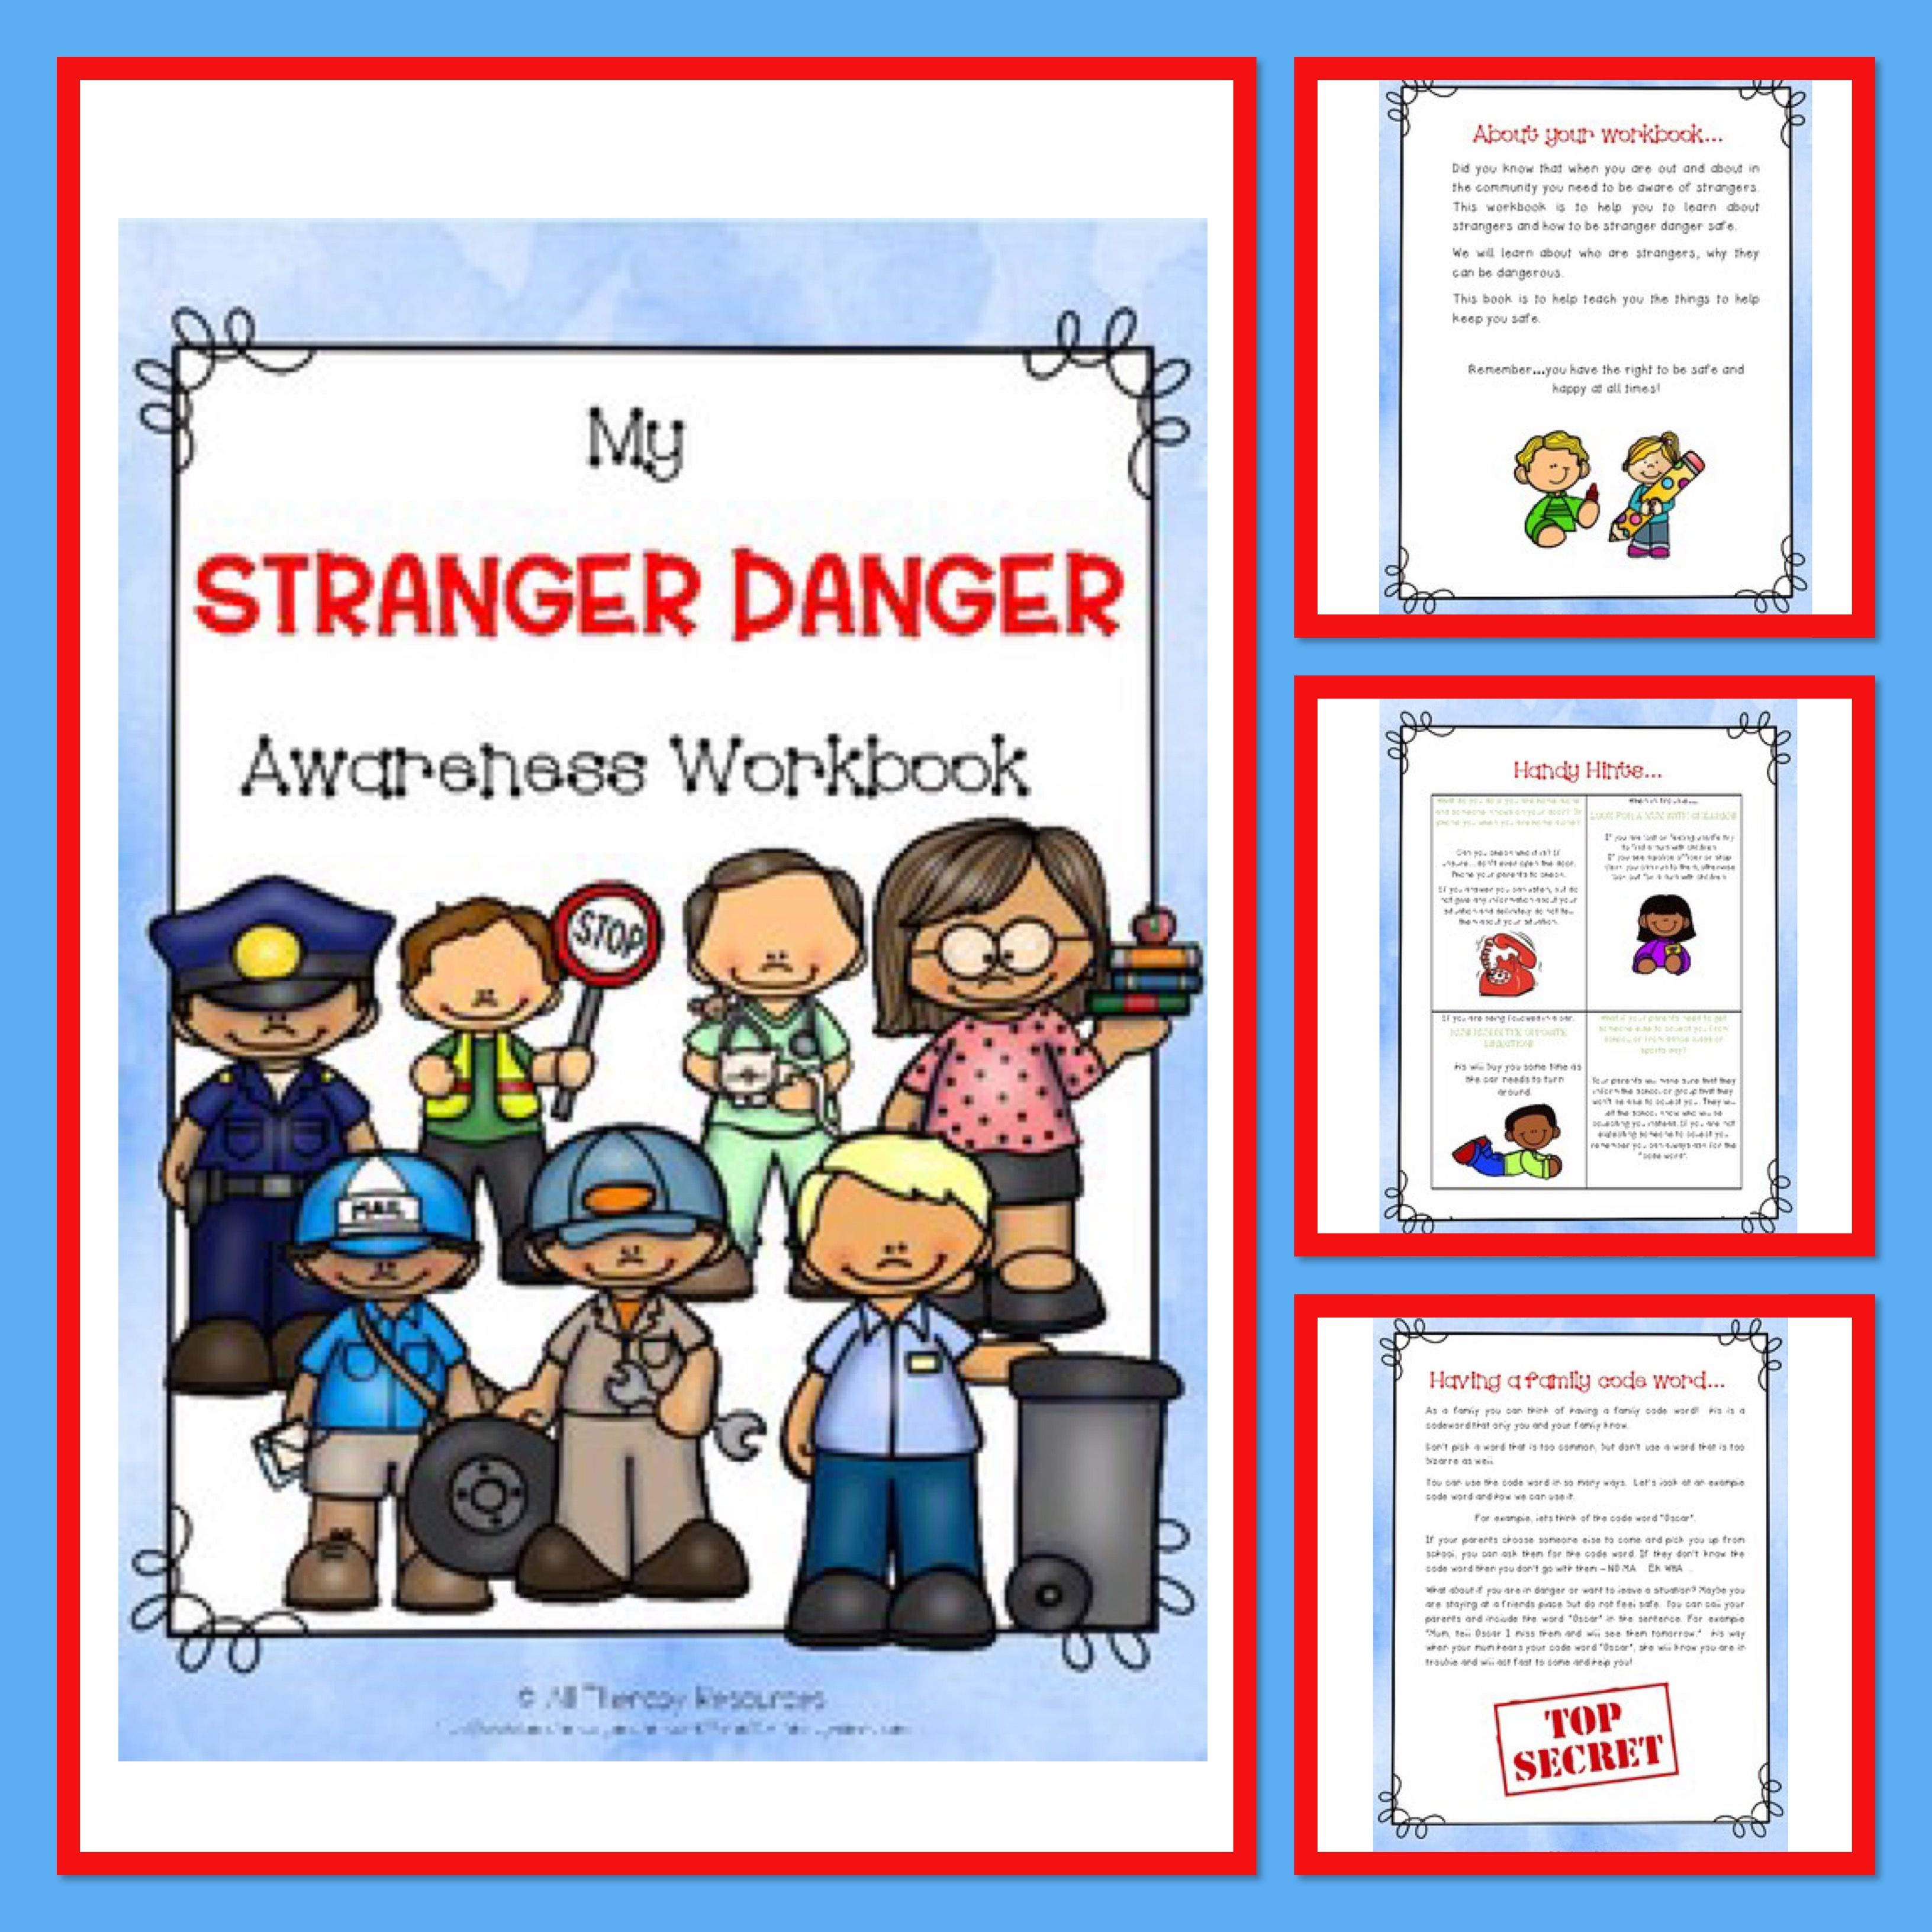 My Stranger Danger Awareness Workbook